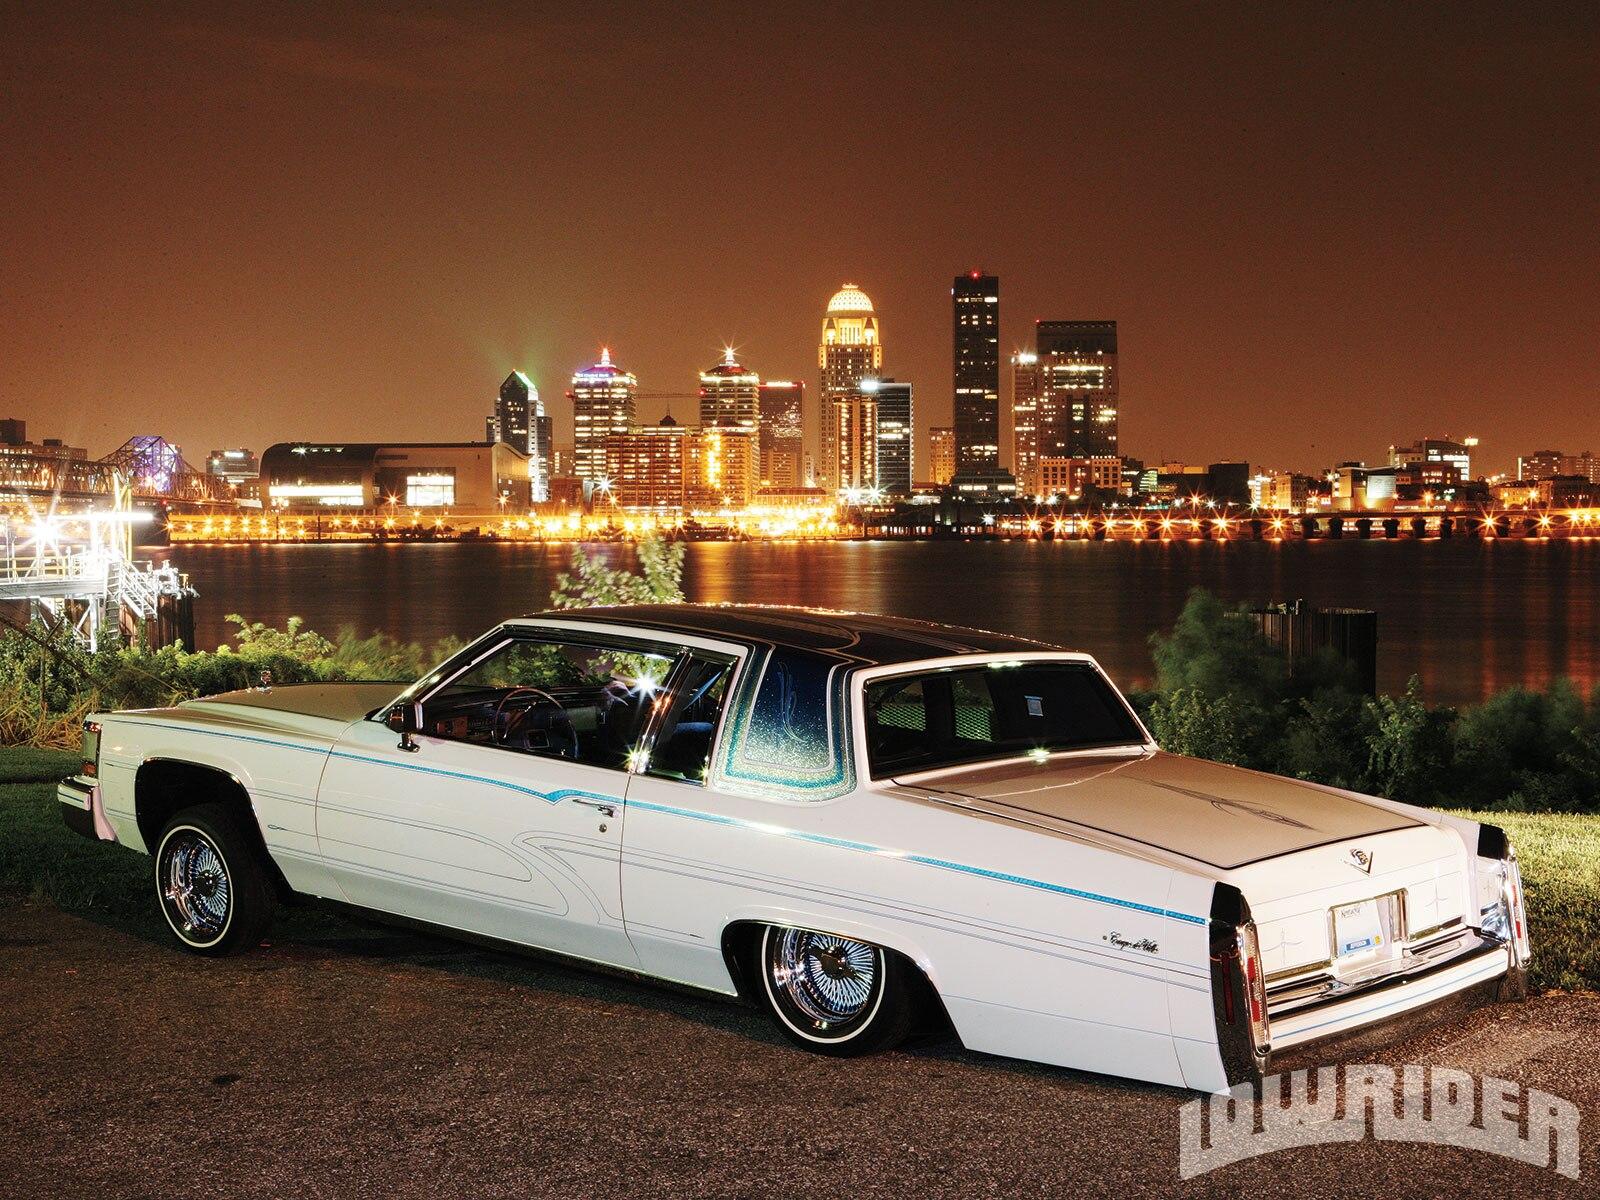 1983 Cadillac Coupe Deville - Caranto Edition - Lowrider Magazine